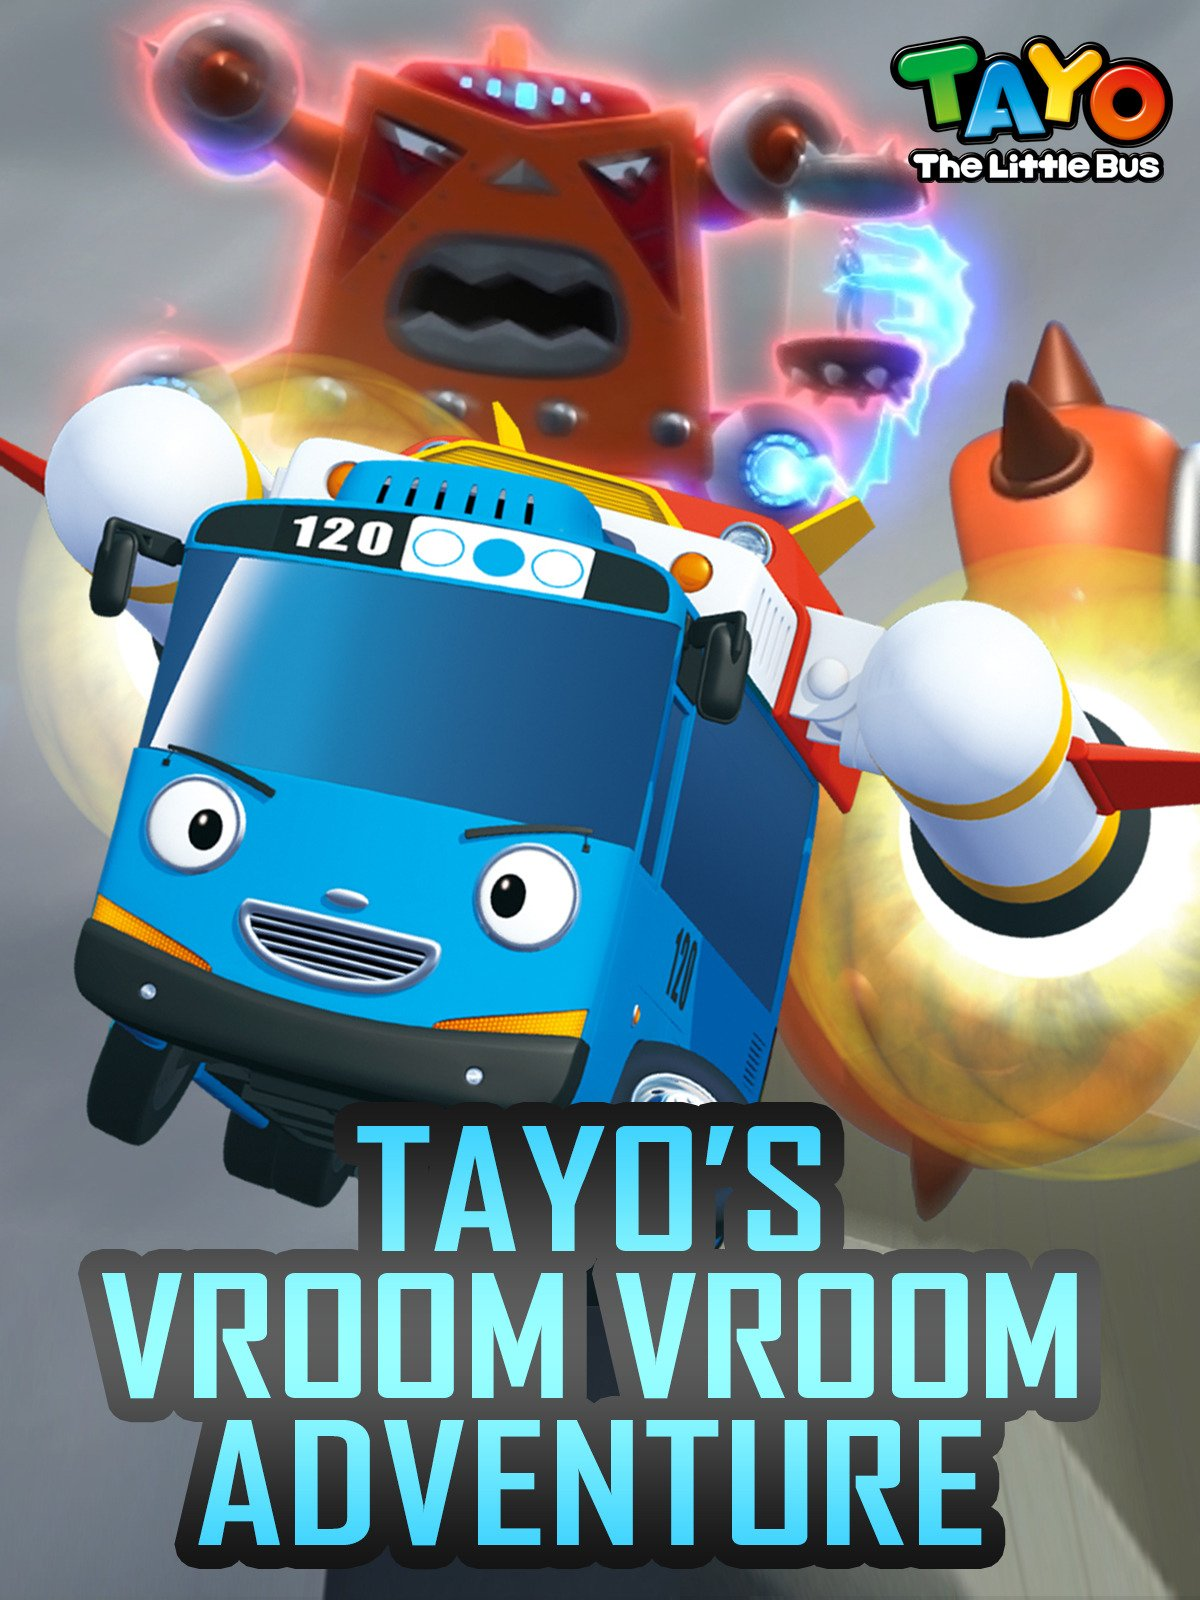 Tayo the Little Bus - Tayo's Vroom Vroom Adventure